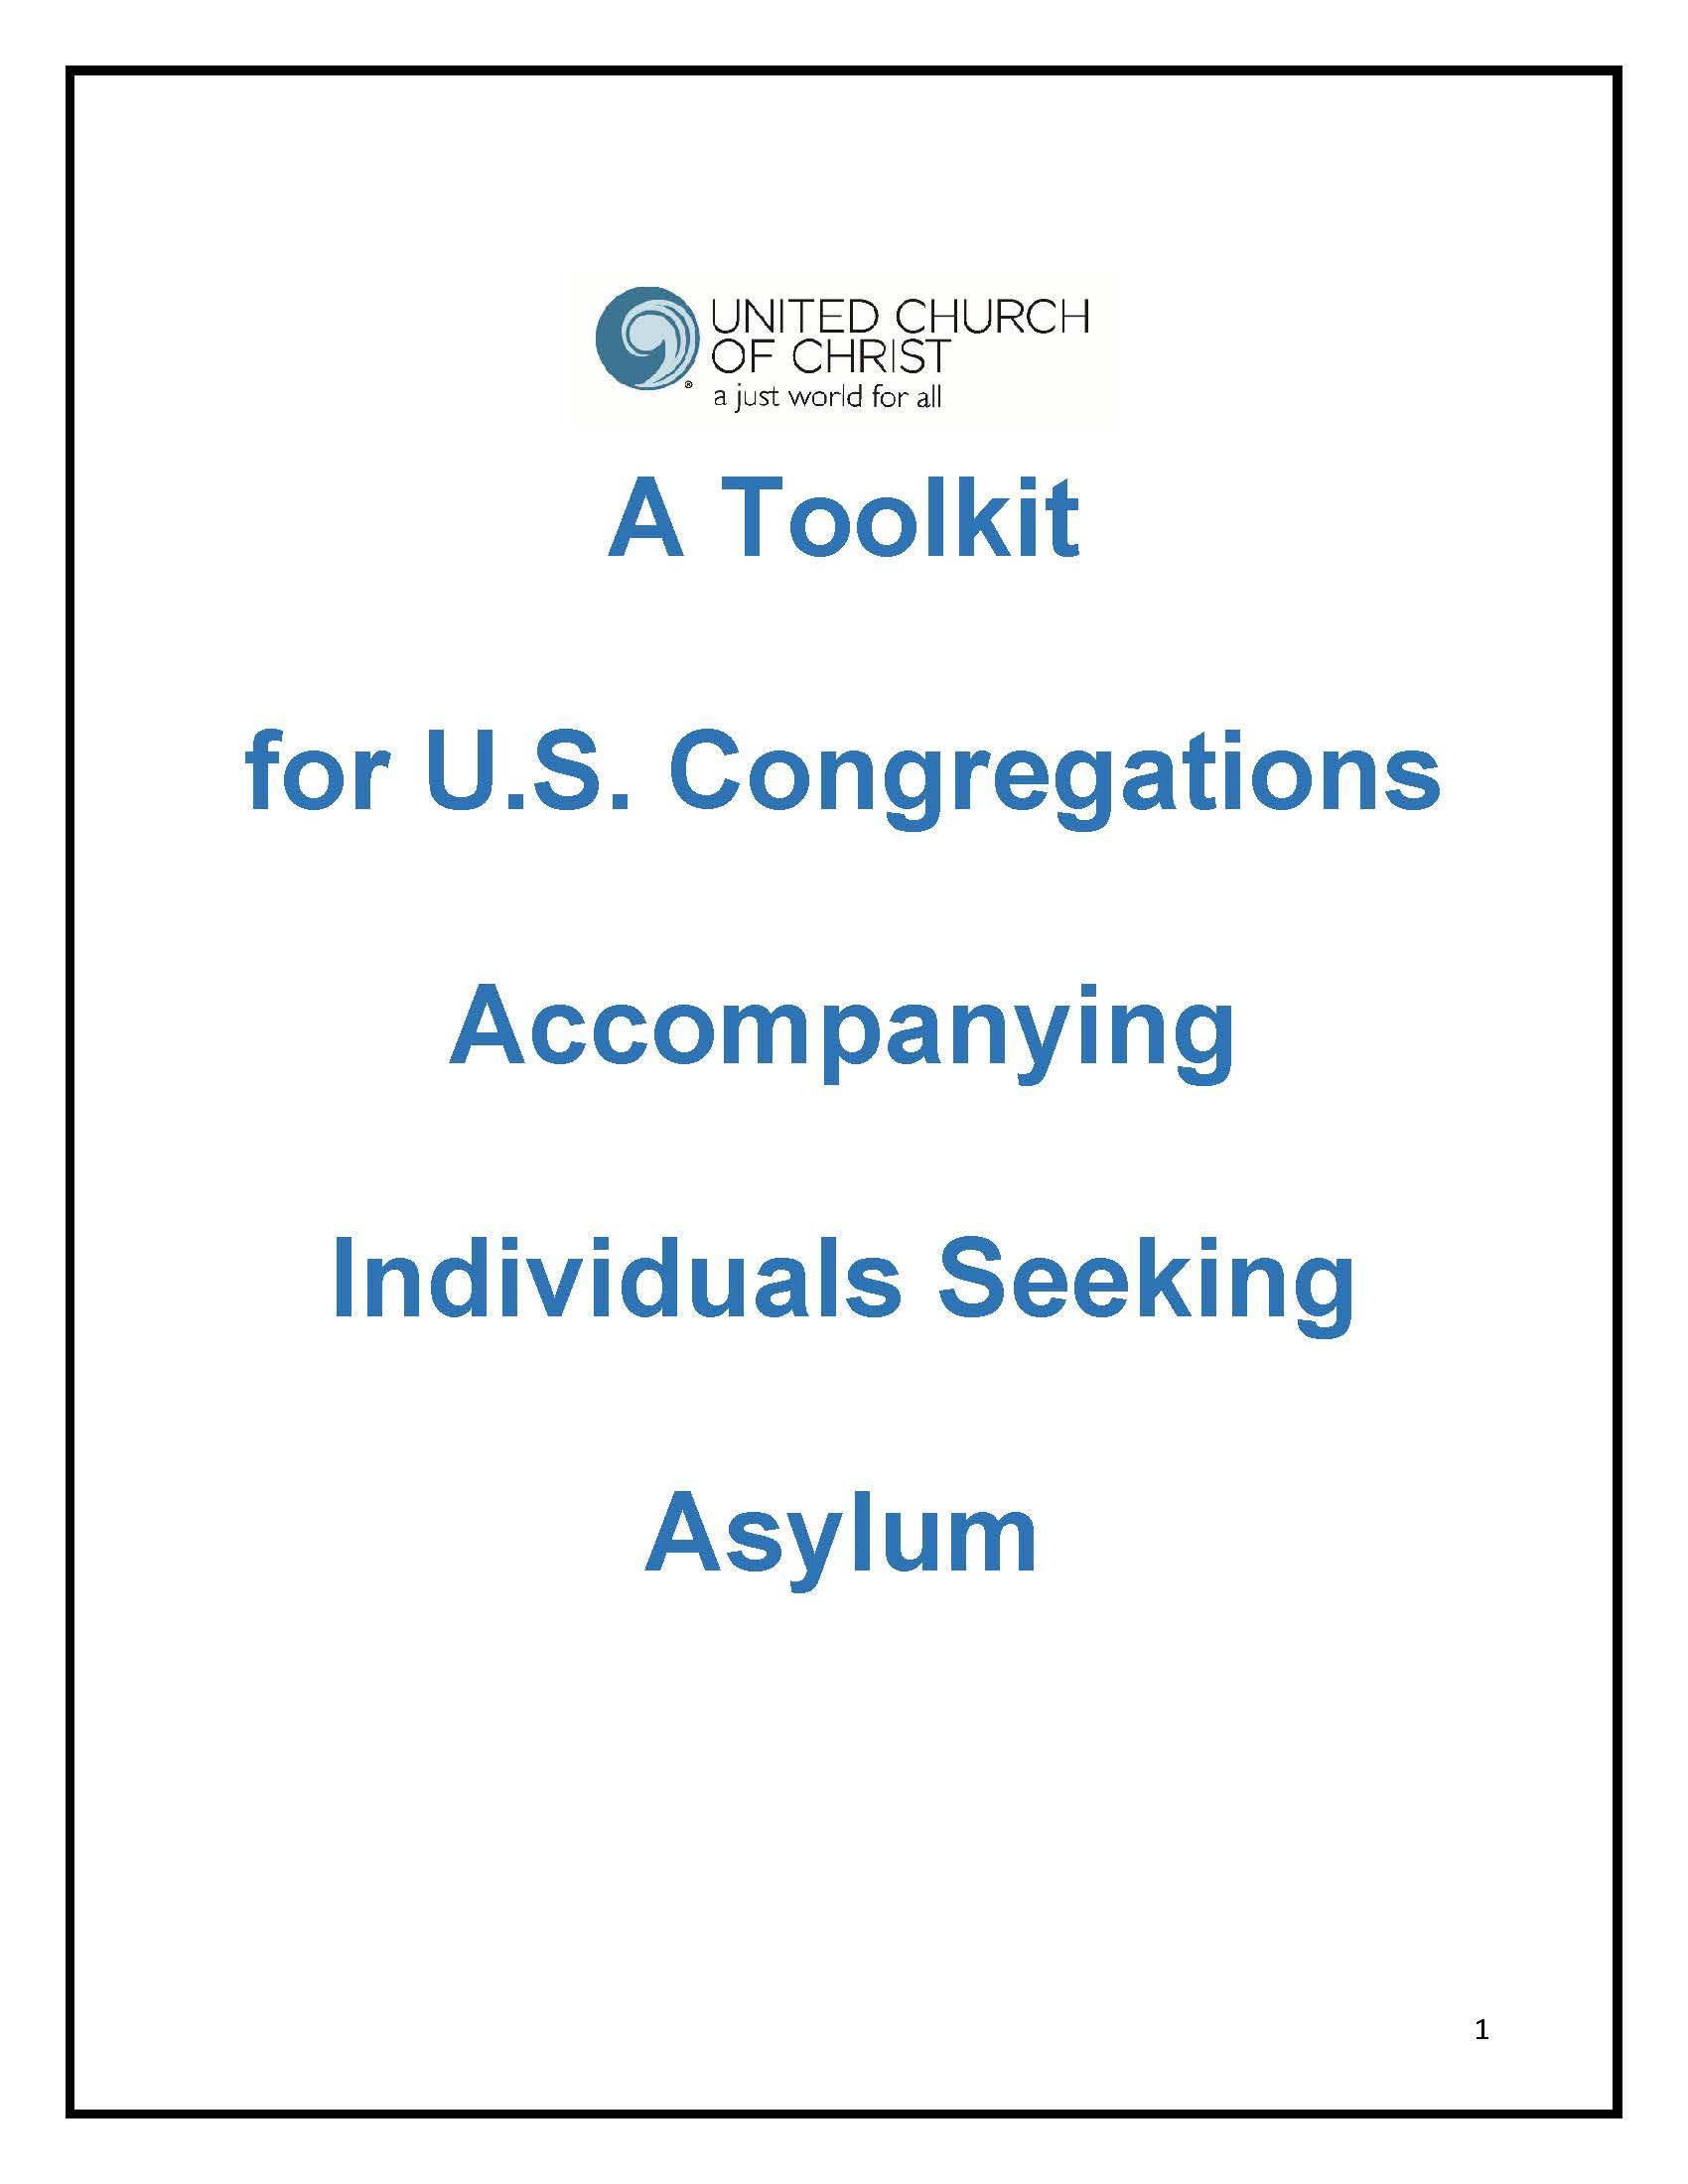 United_Church_of_Christ_Asylum_Accompaniment_Toolkit_2020_Page_01.jpg